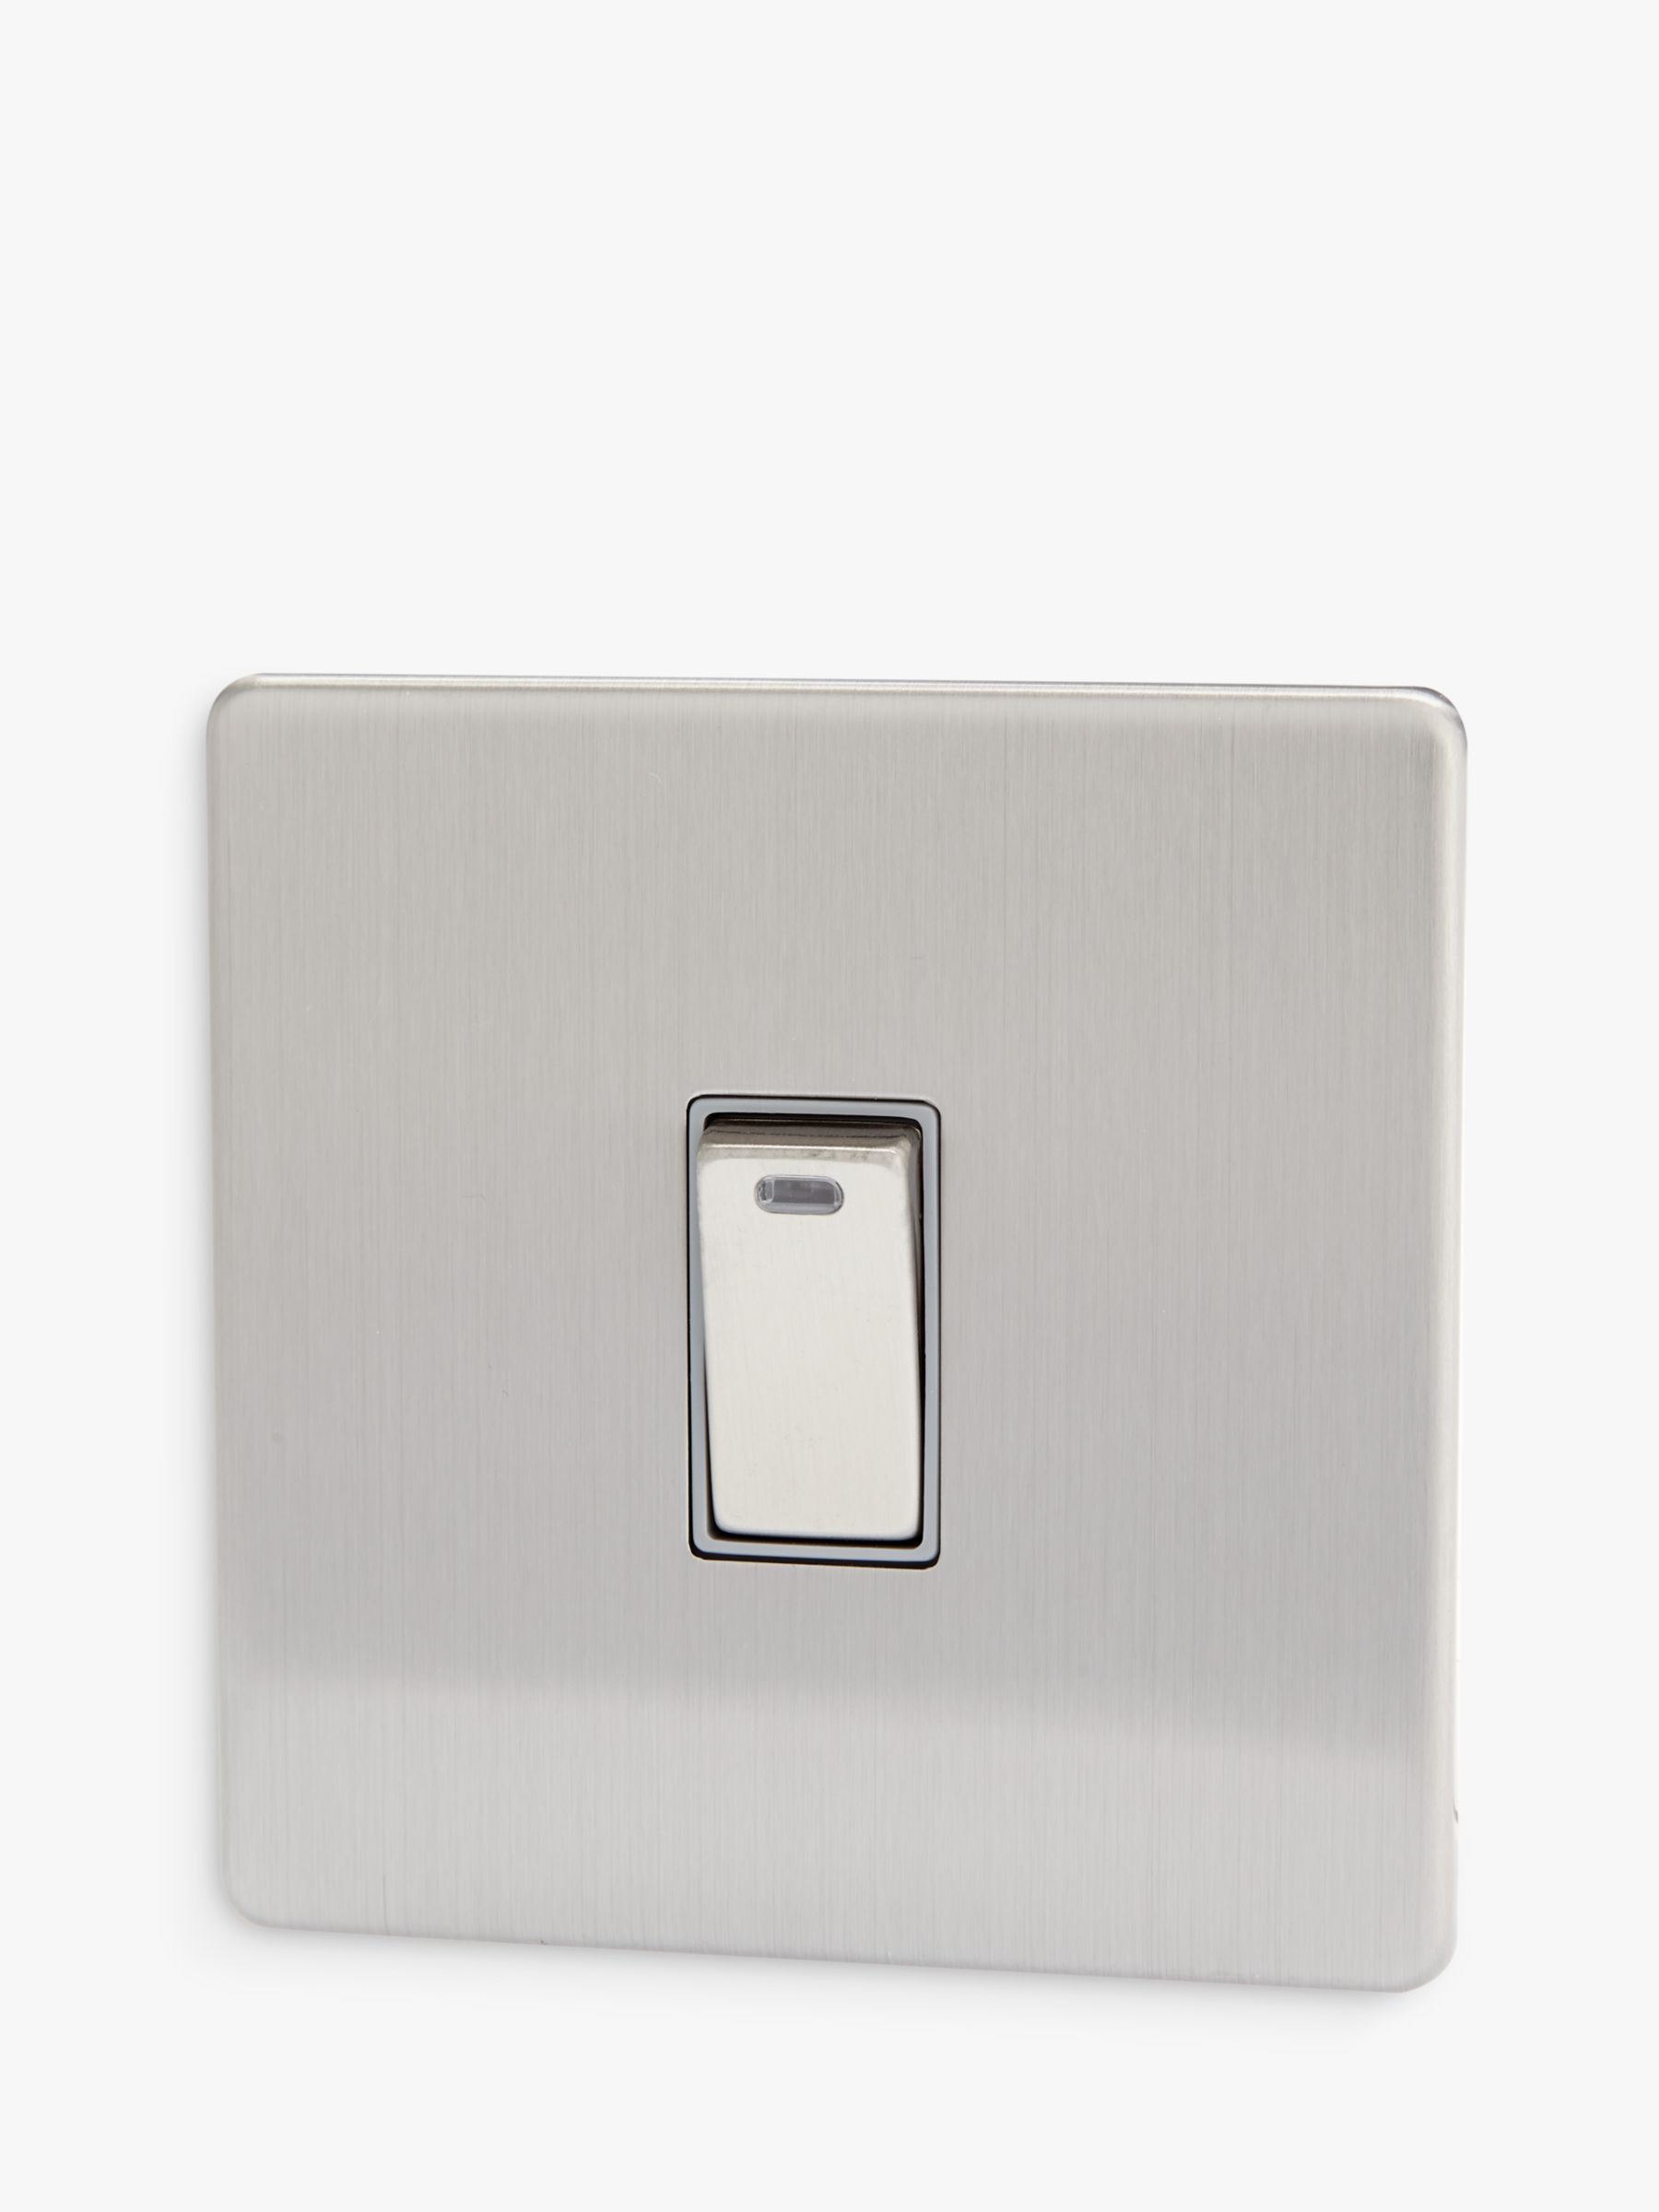 Varilight Varilight 1 Gang Double Pole Rocker Switch with Neon Indicator Light